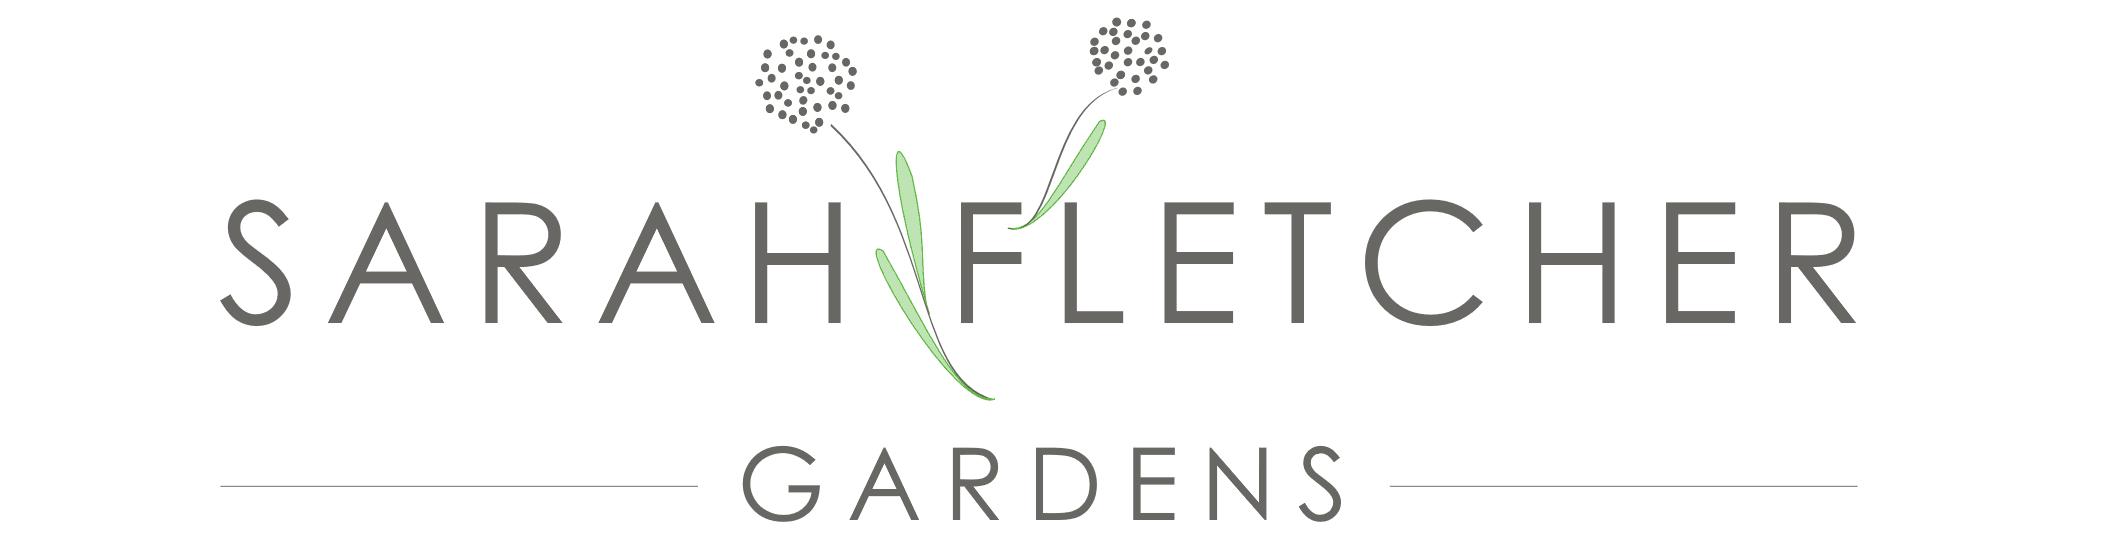 Sarah Fletcher Gardens